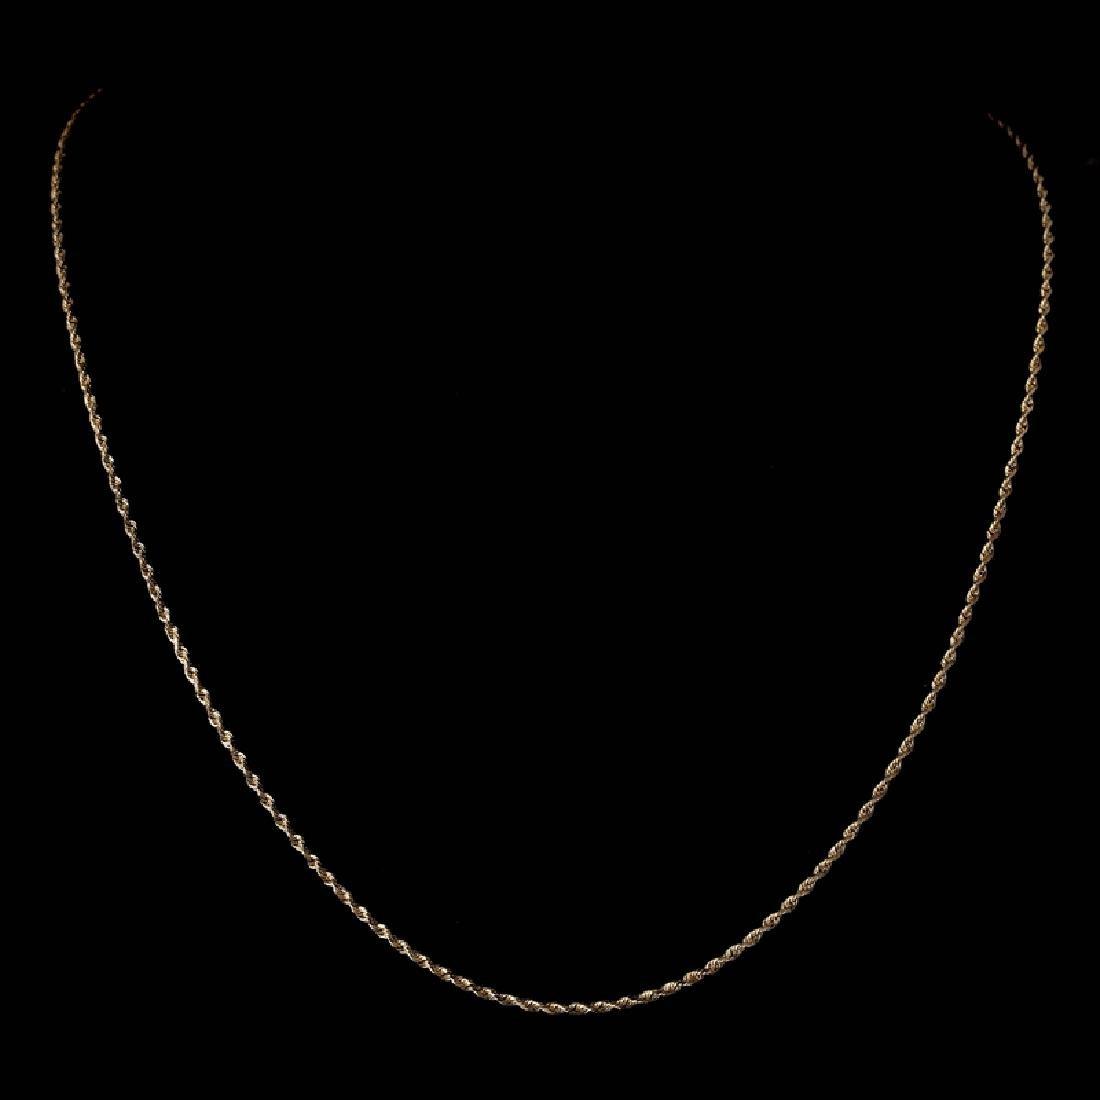 *Fine Jewelry 14KT Gold, 3.7GR, 18'' Diamond Cut Rope